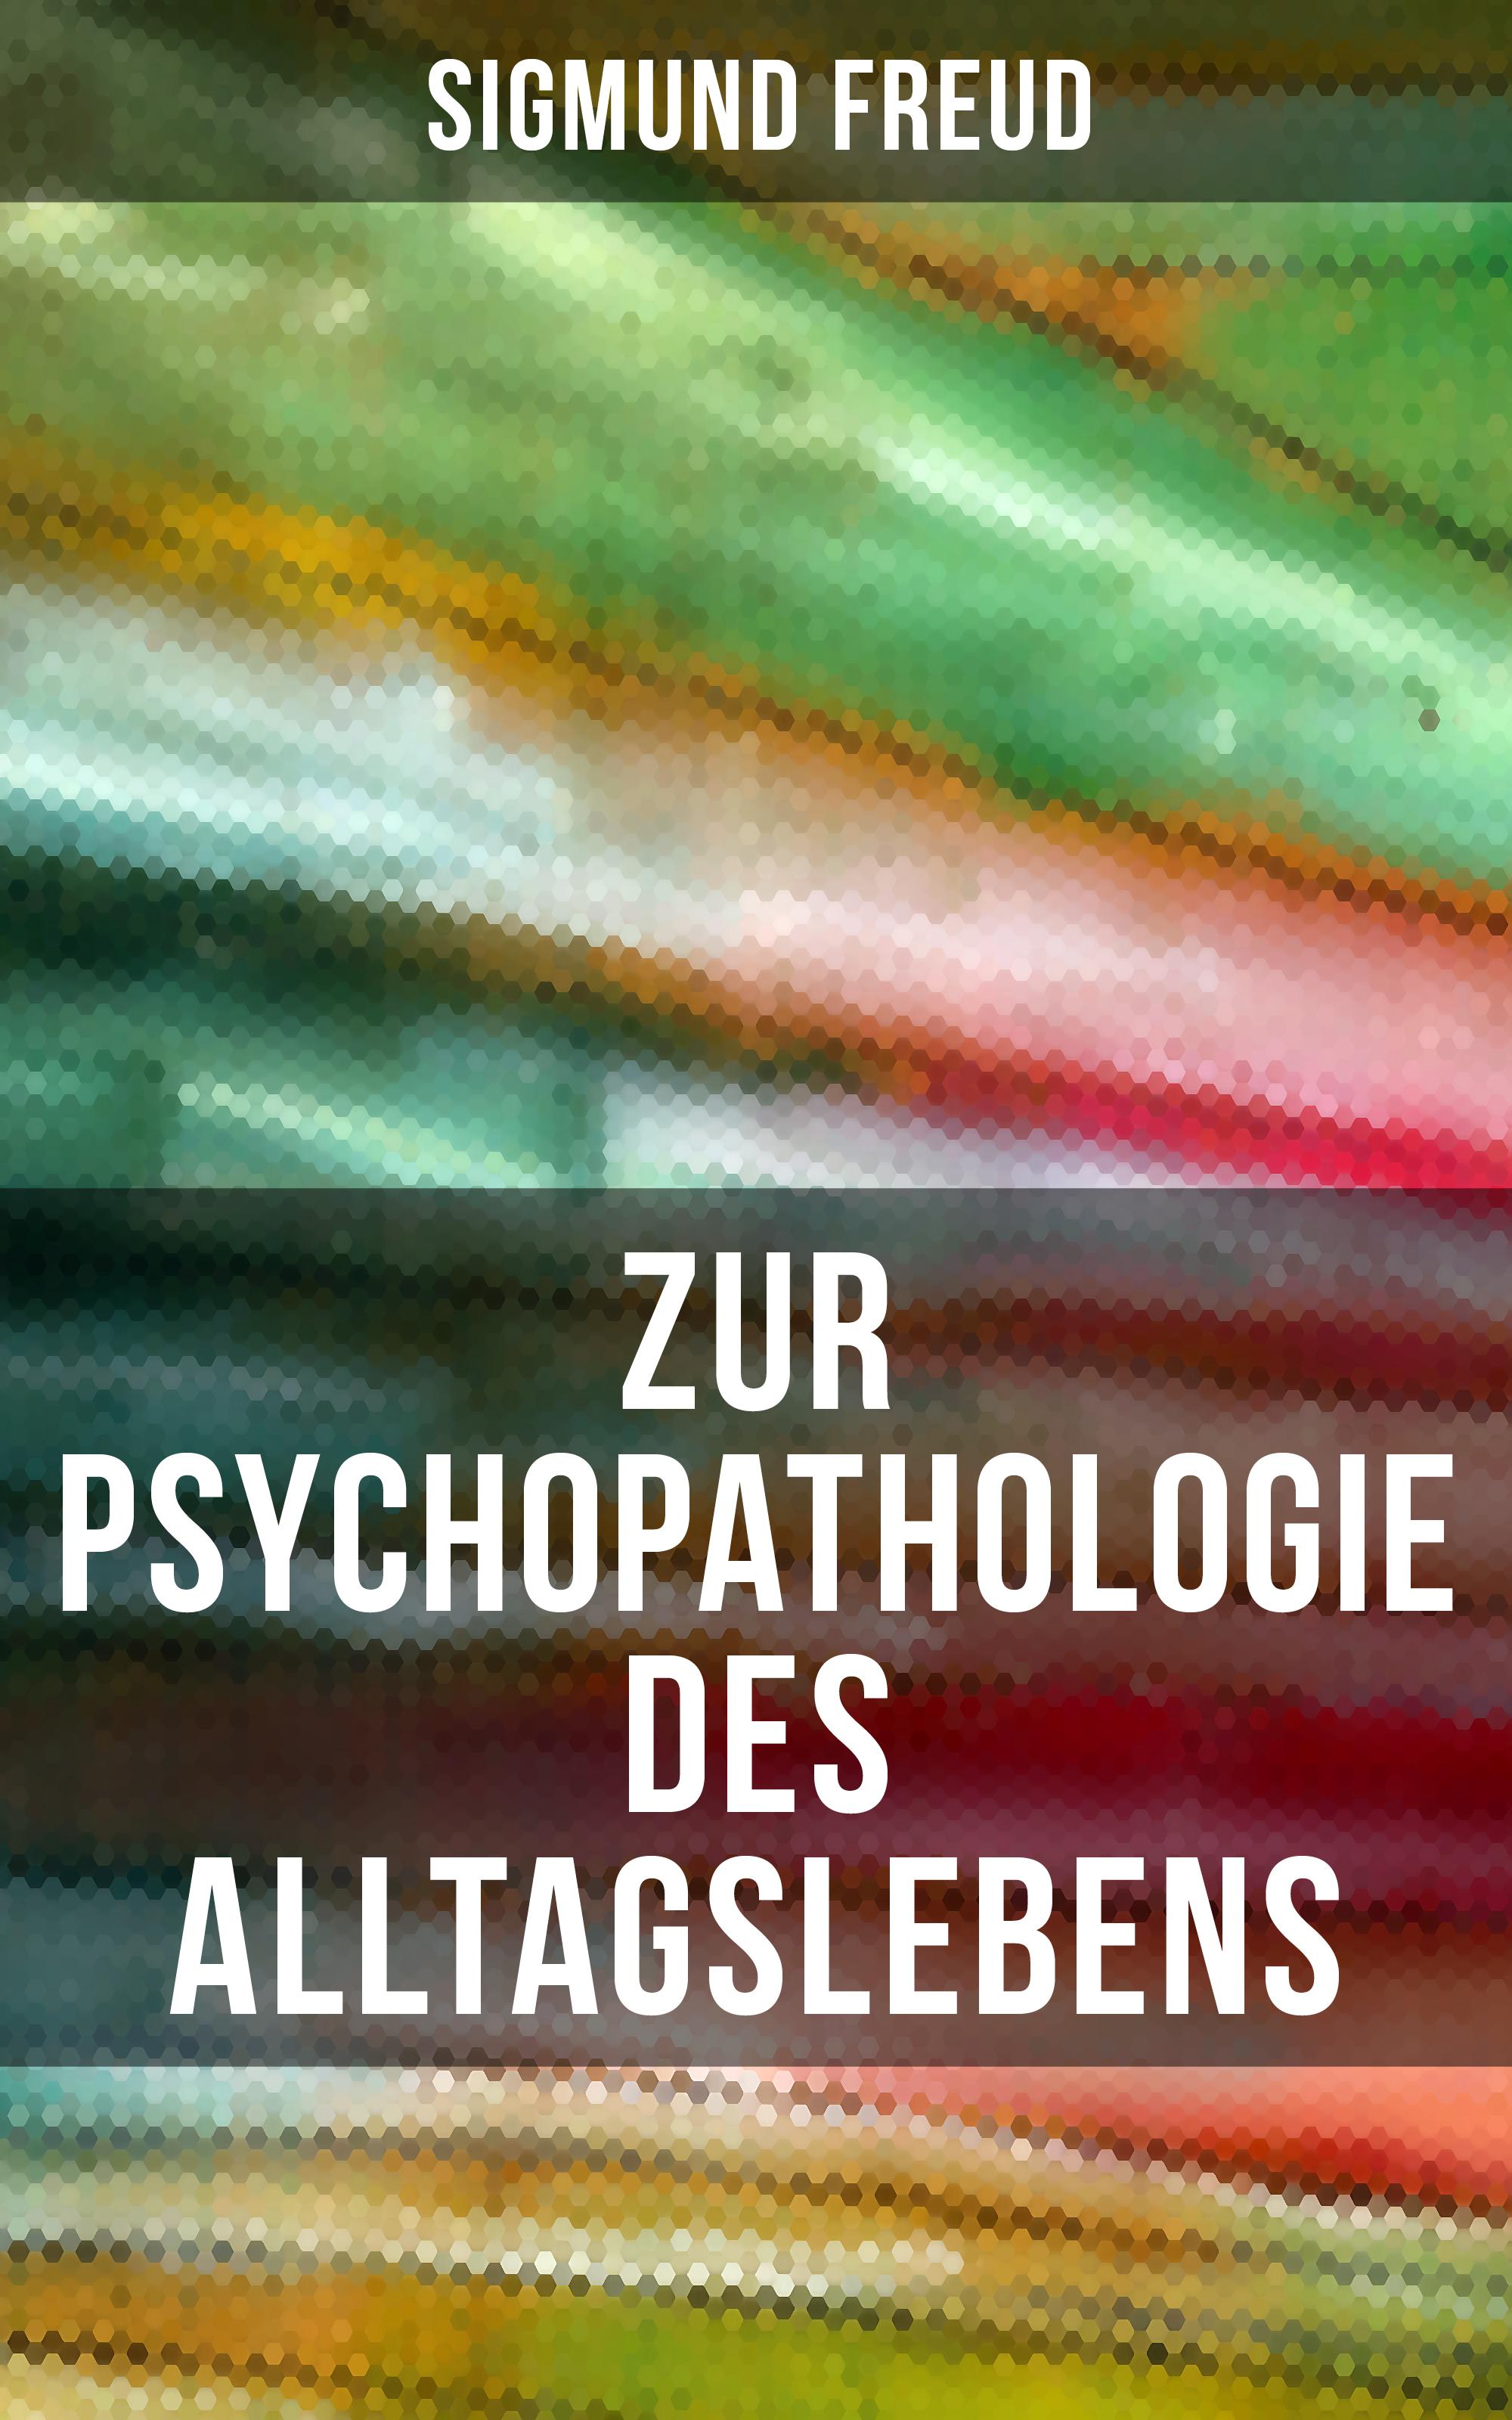 цена на Зигмунд Фрейд Zur Psychopathologie des Alltagslebens